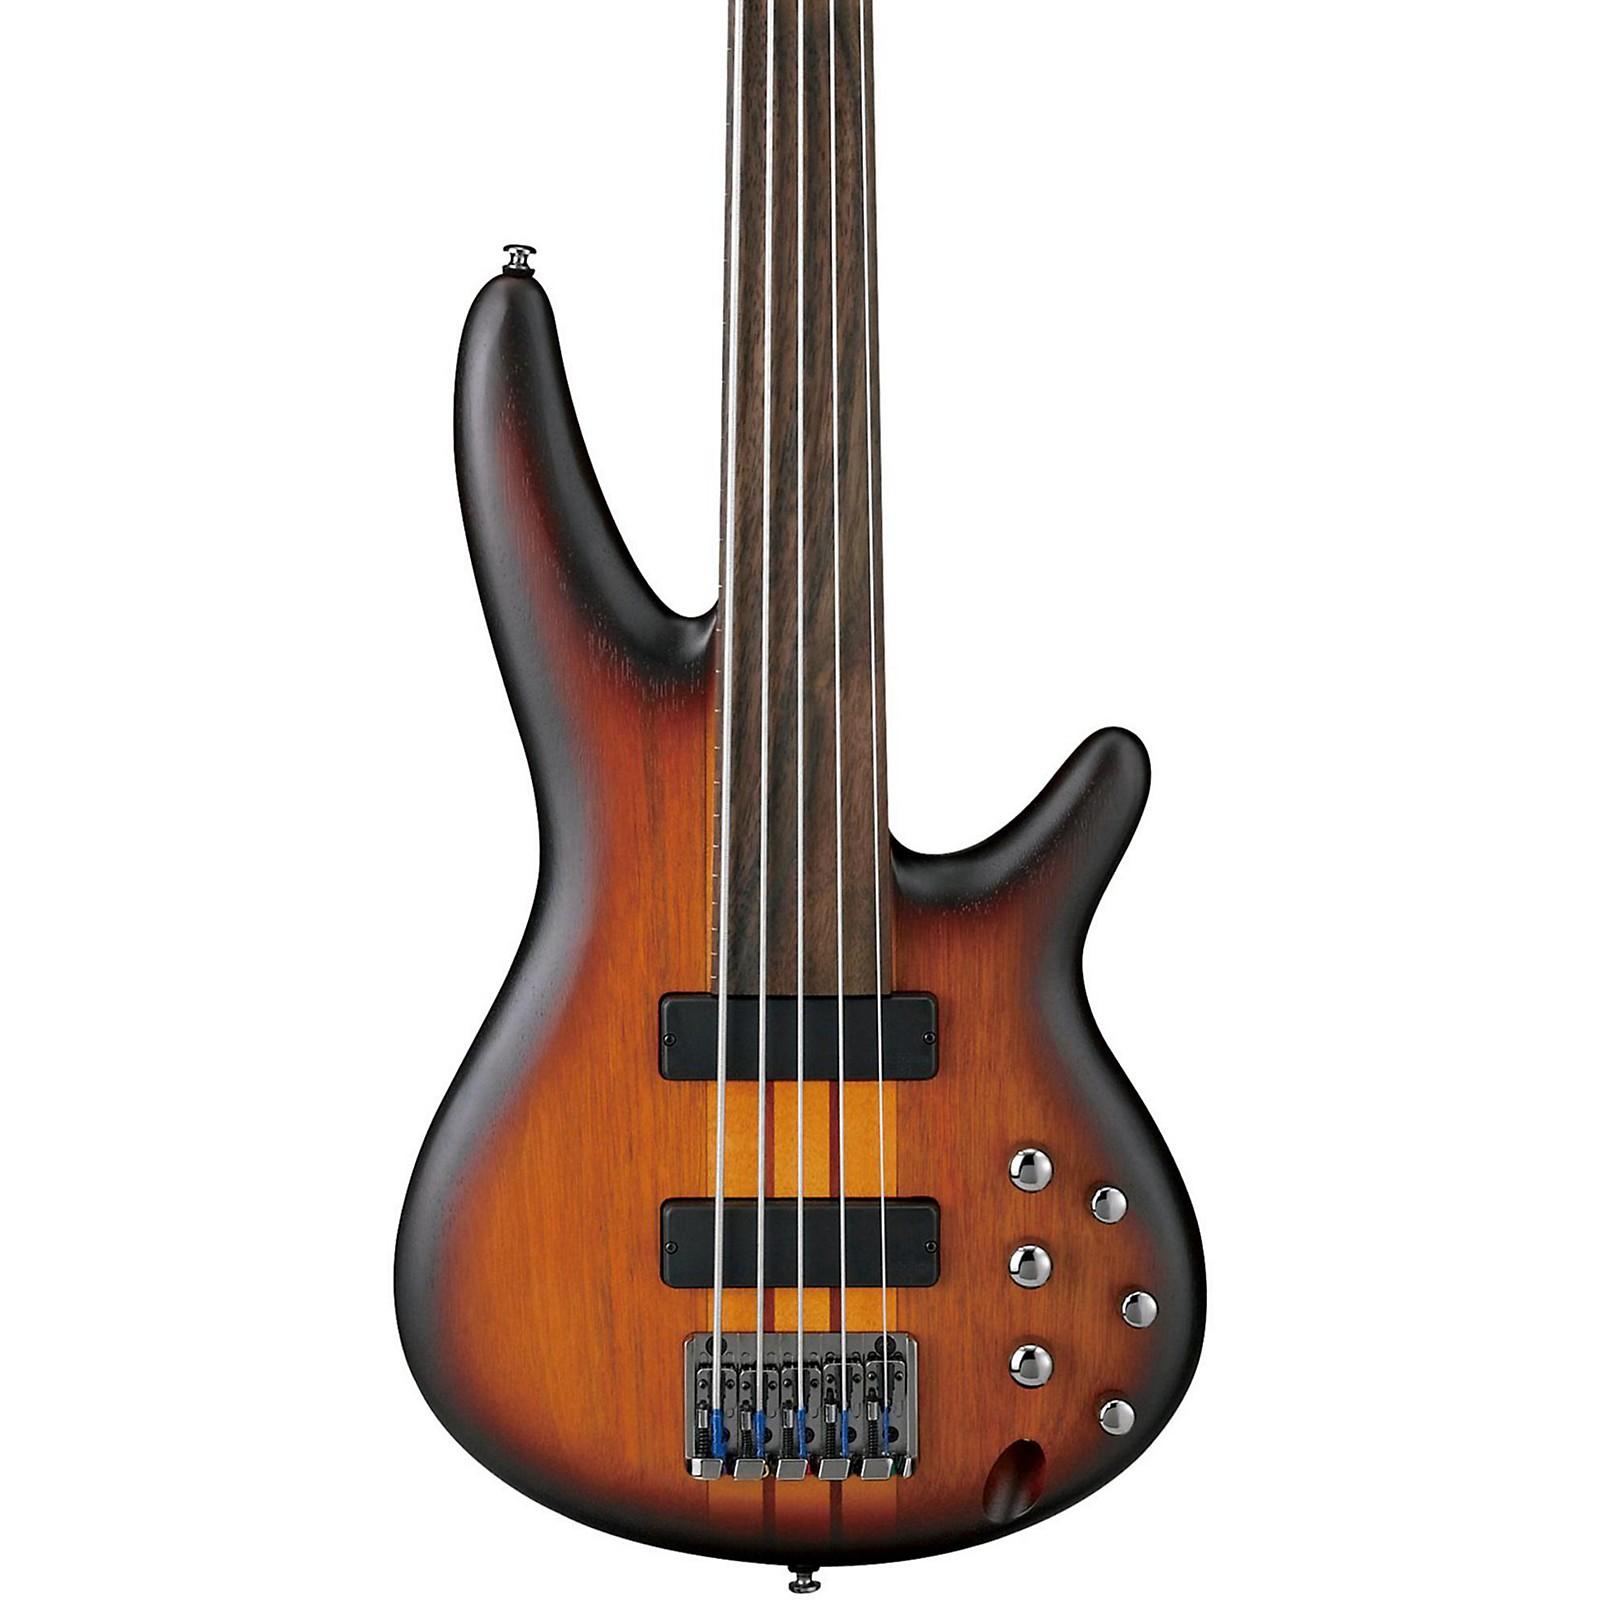 Ibanez Bass Workshop SR Portamento SRF705 Fretless 5-String Electric Bass